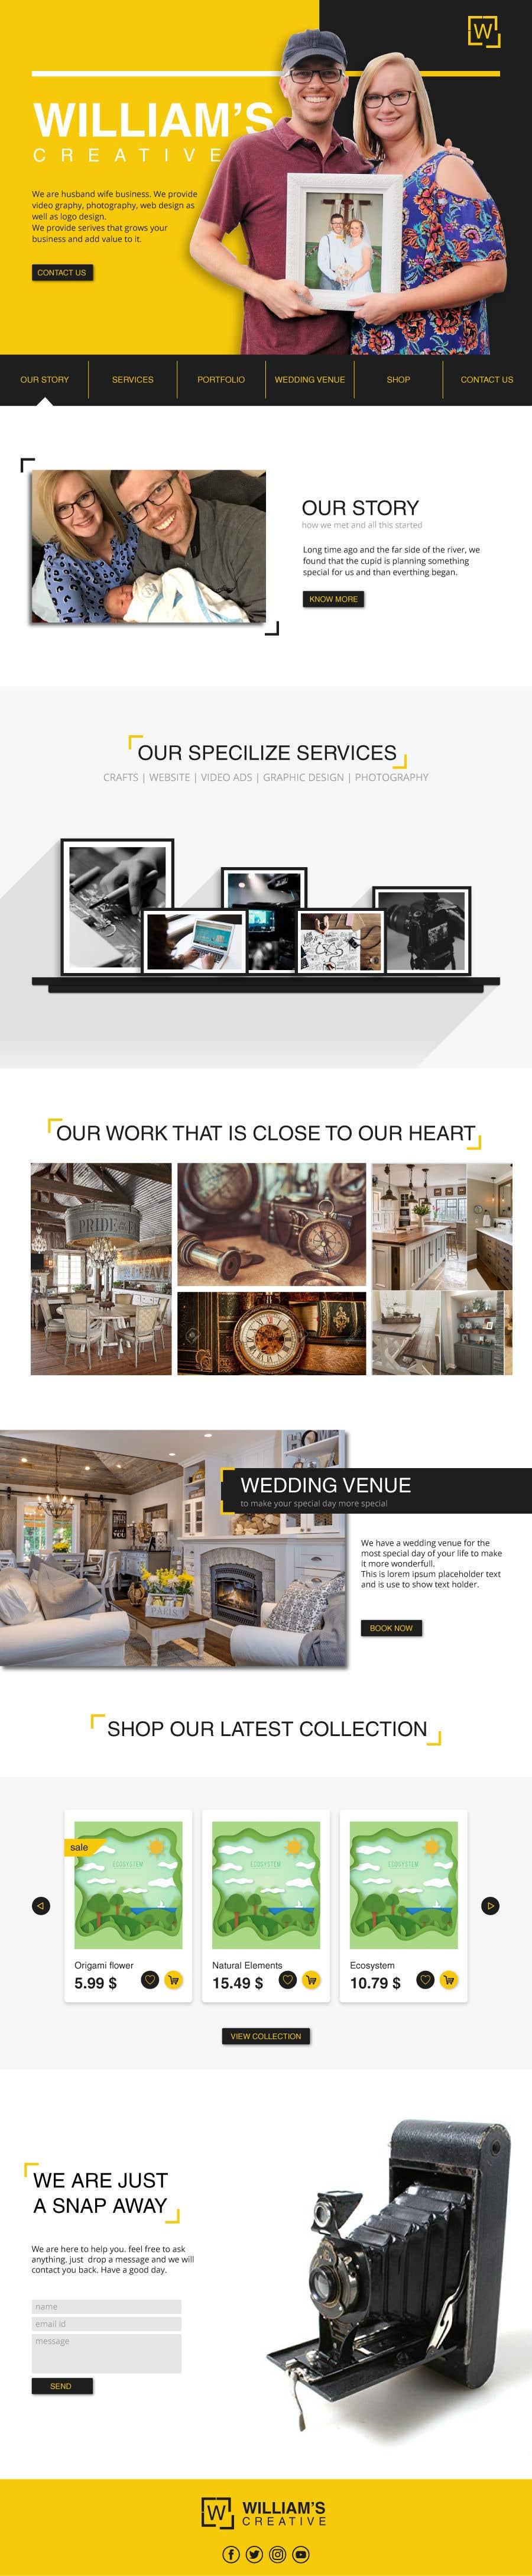 Kilpailutyö #47 kilpailussa Design Clean, Minimalist, Professional Website Layout and Logo